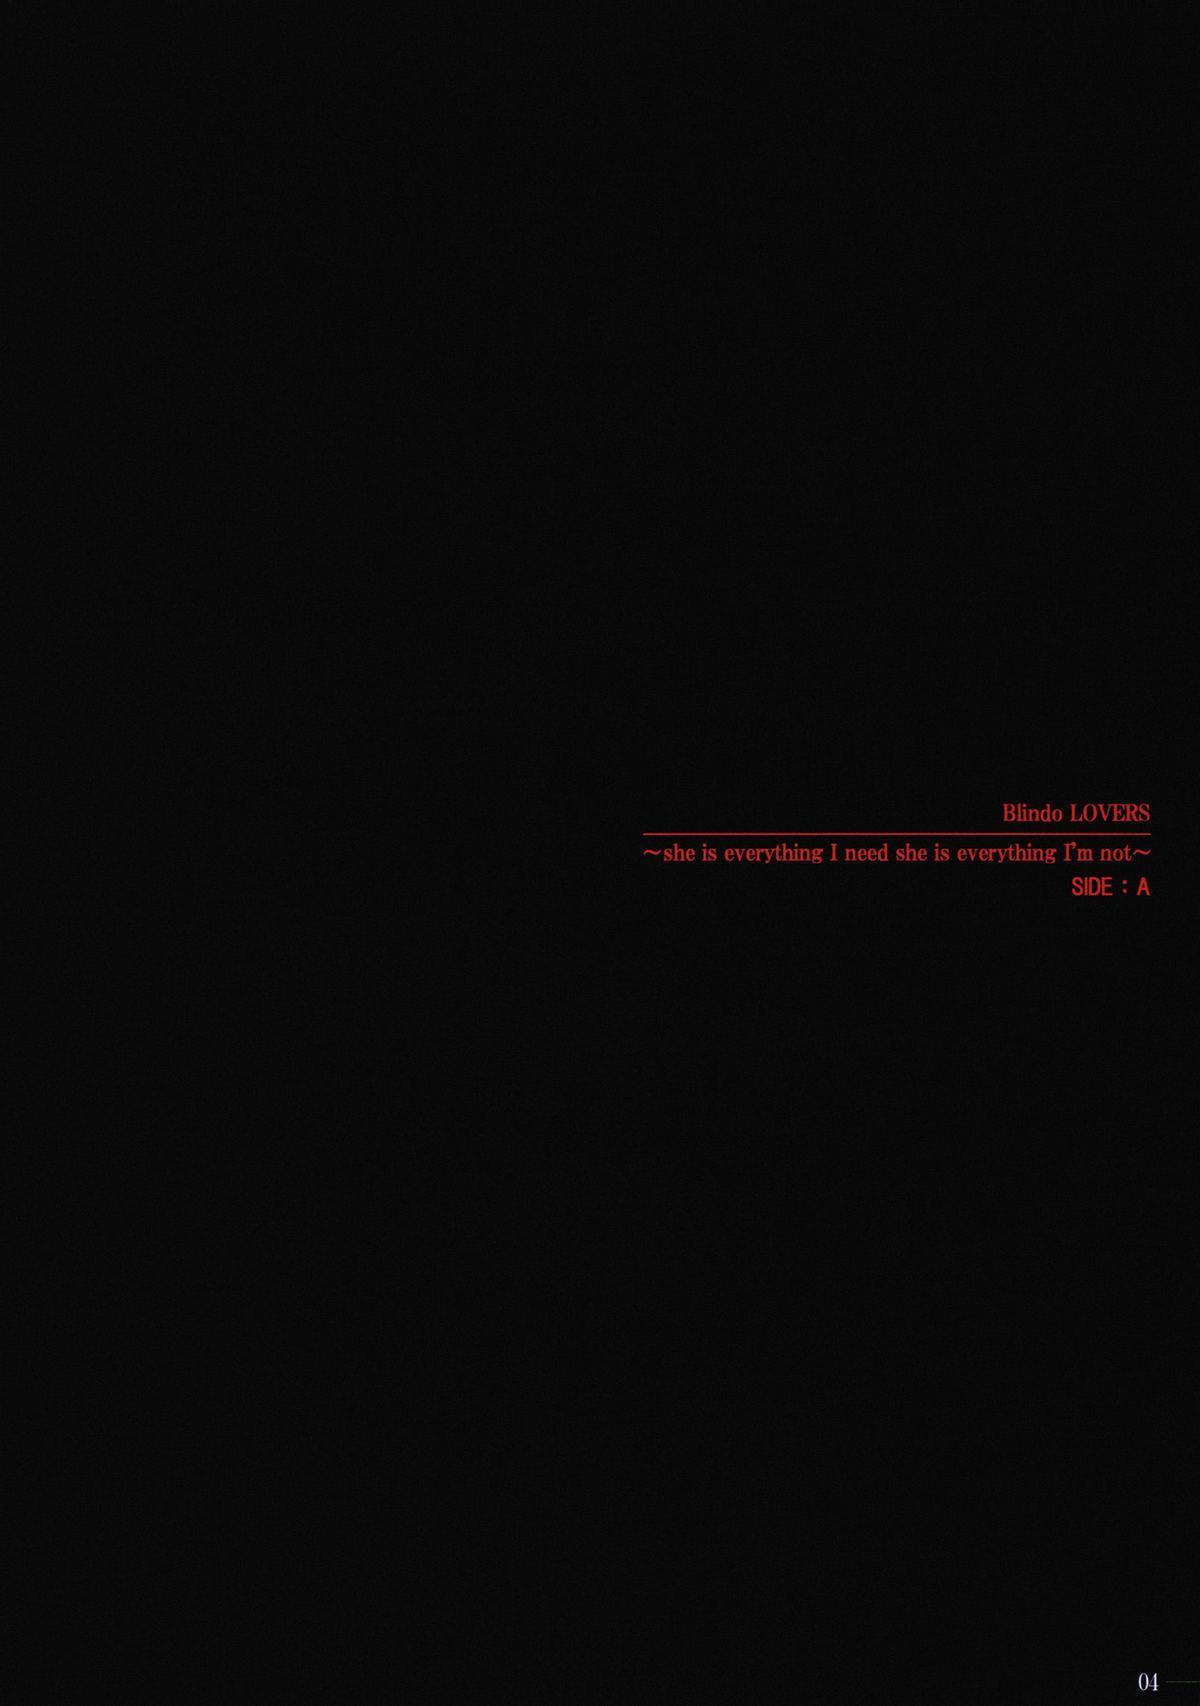 (C77) [Makino Jimusho (Taki Minashika)] LOVERS ~Koi ni Ochitara... ~Blindo LOVERS ~she is everything I need she is everything I'm not~ SIDE:A 2